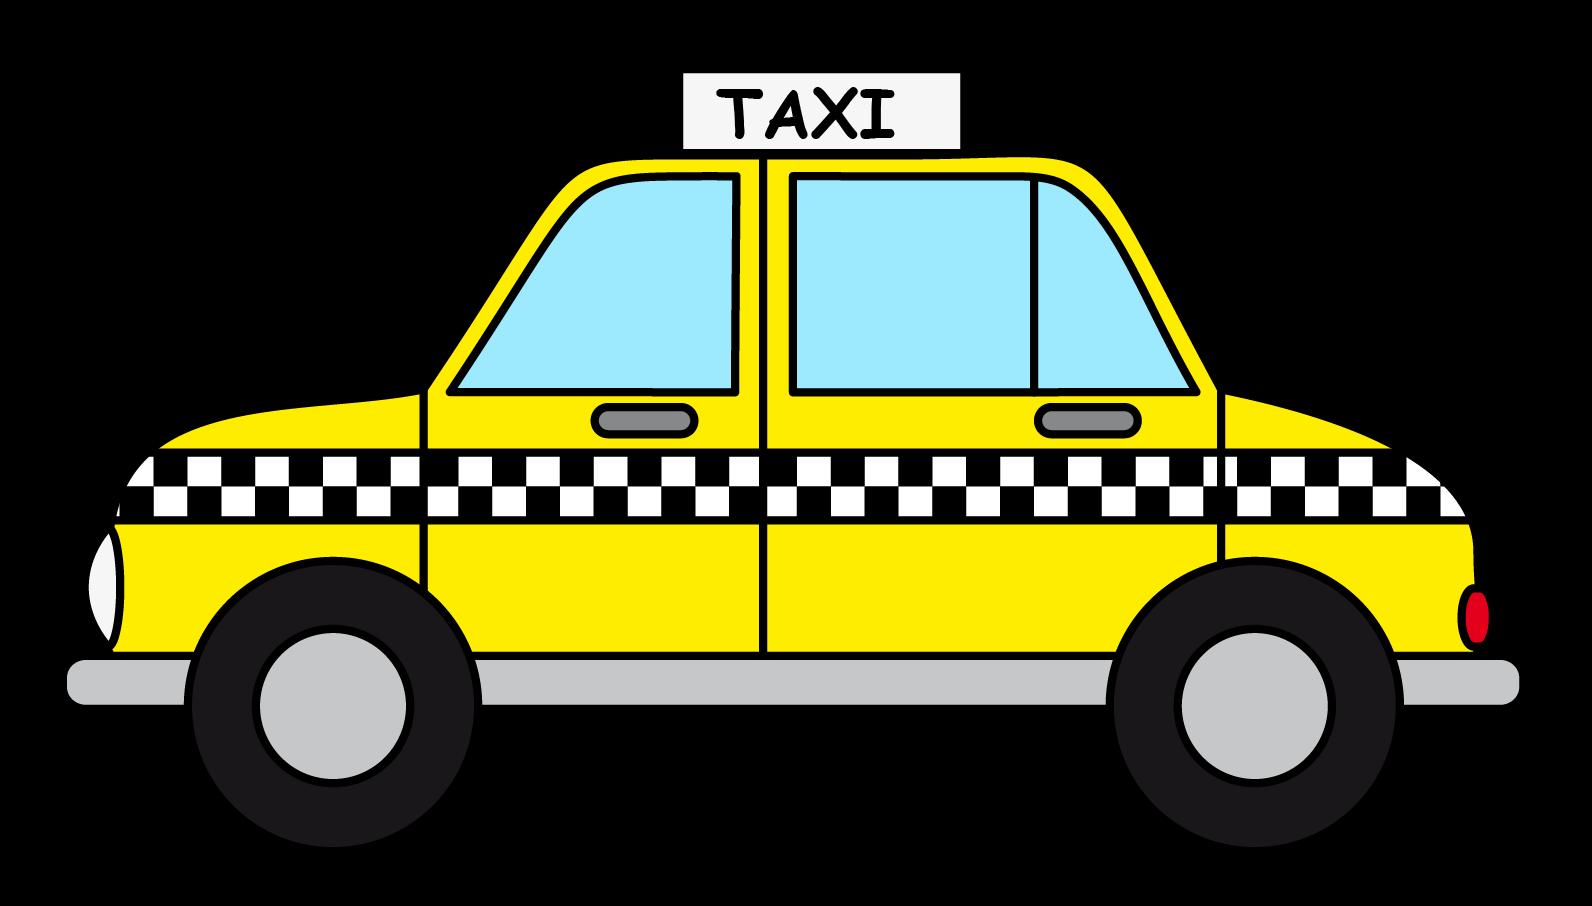 Free Cartoon Taxi Cab Clip Art